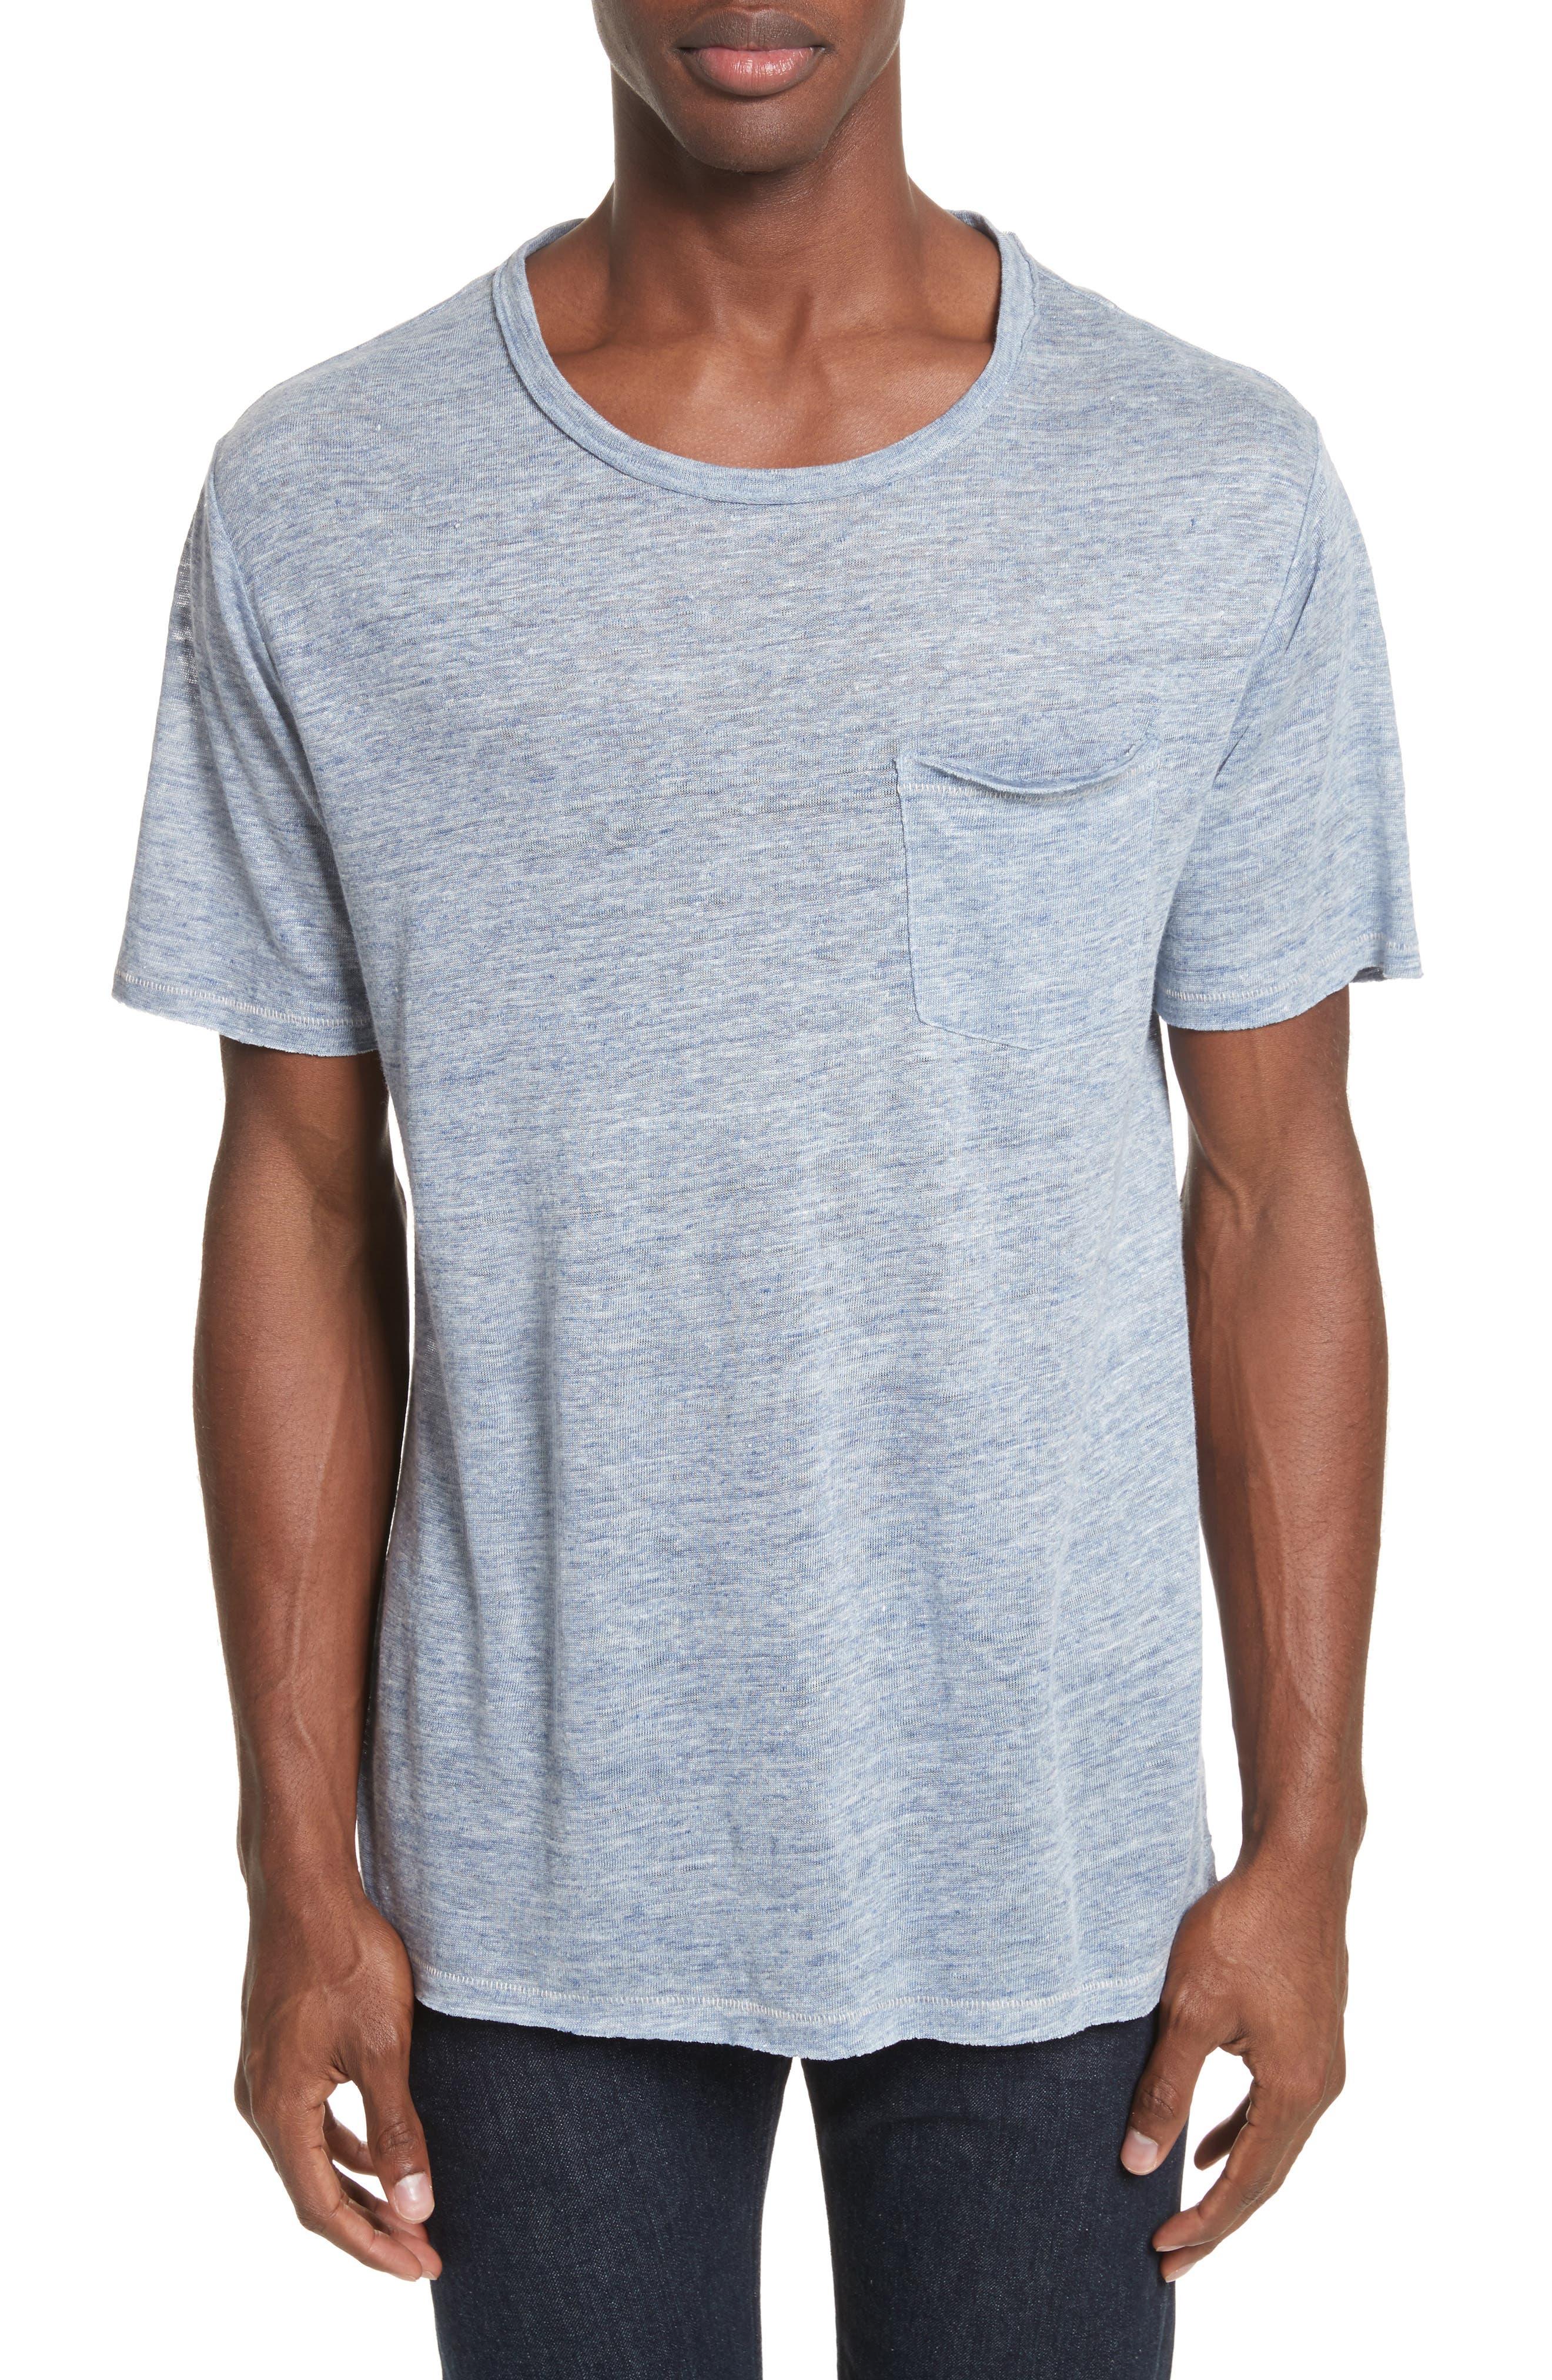 Owen T-Shirt,                             Main thumbnail 1, color,